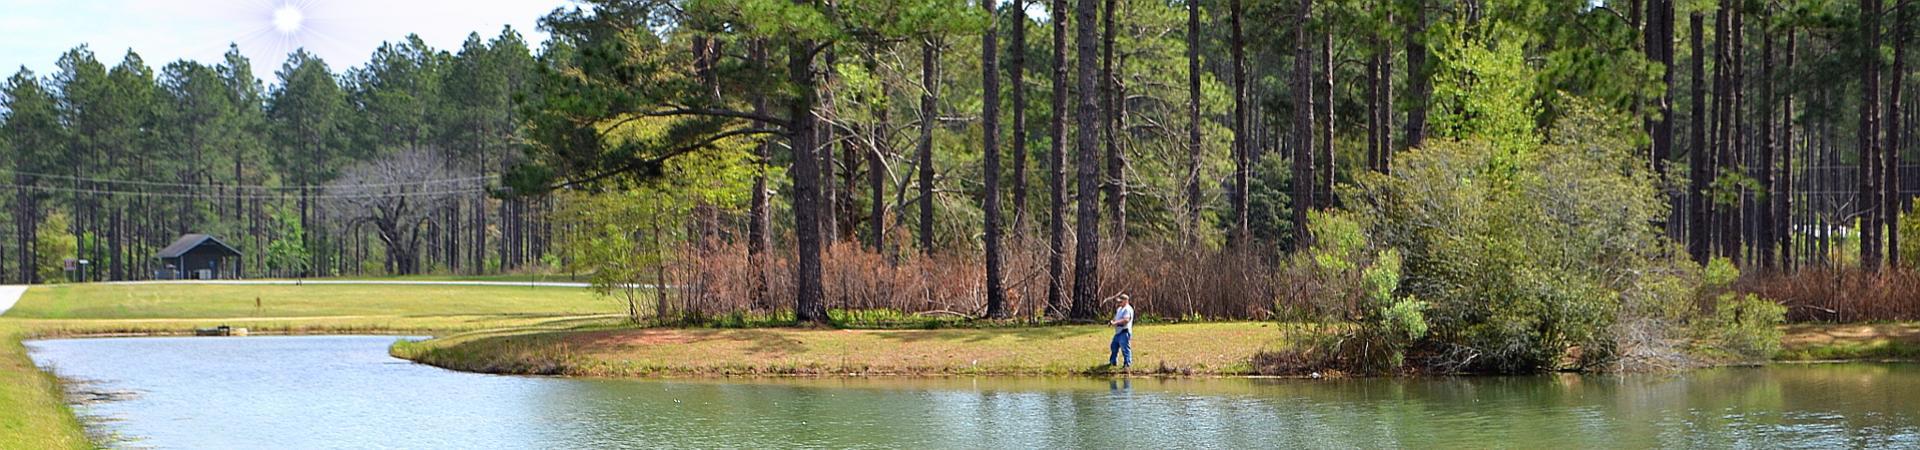 Fishing on Pond